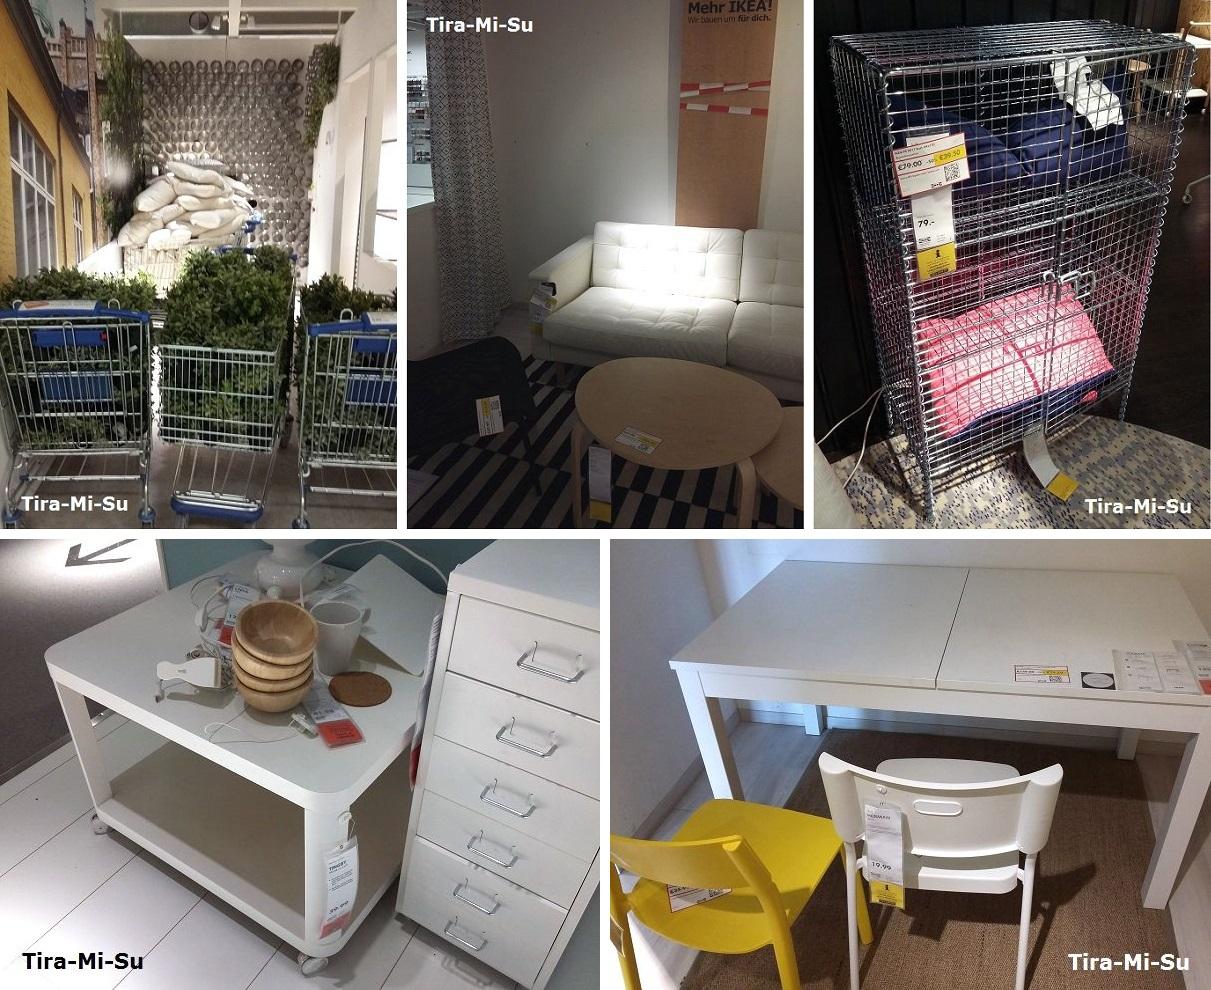 blogworld of tira mi su ikea halle leipzig im umgestaltungsprozess. Black Bedroom Furniture Sets. Home Design Ideas